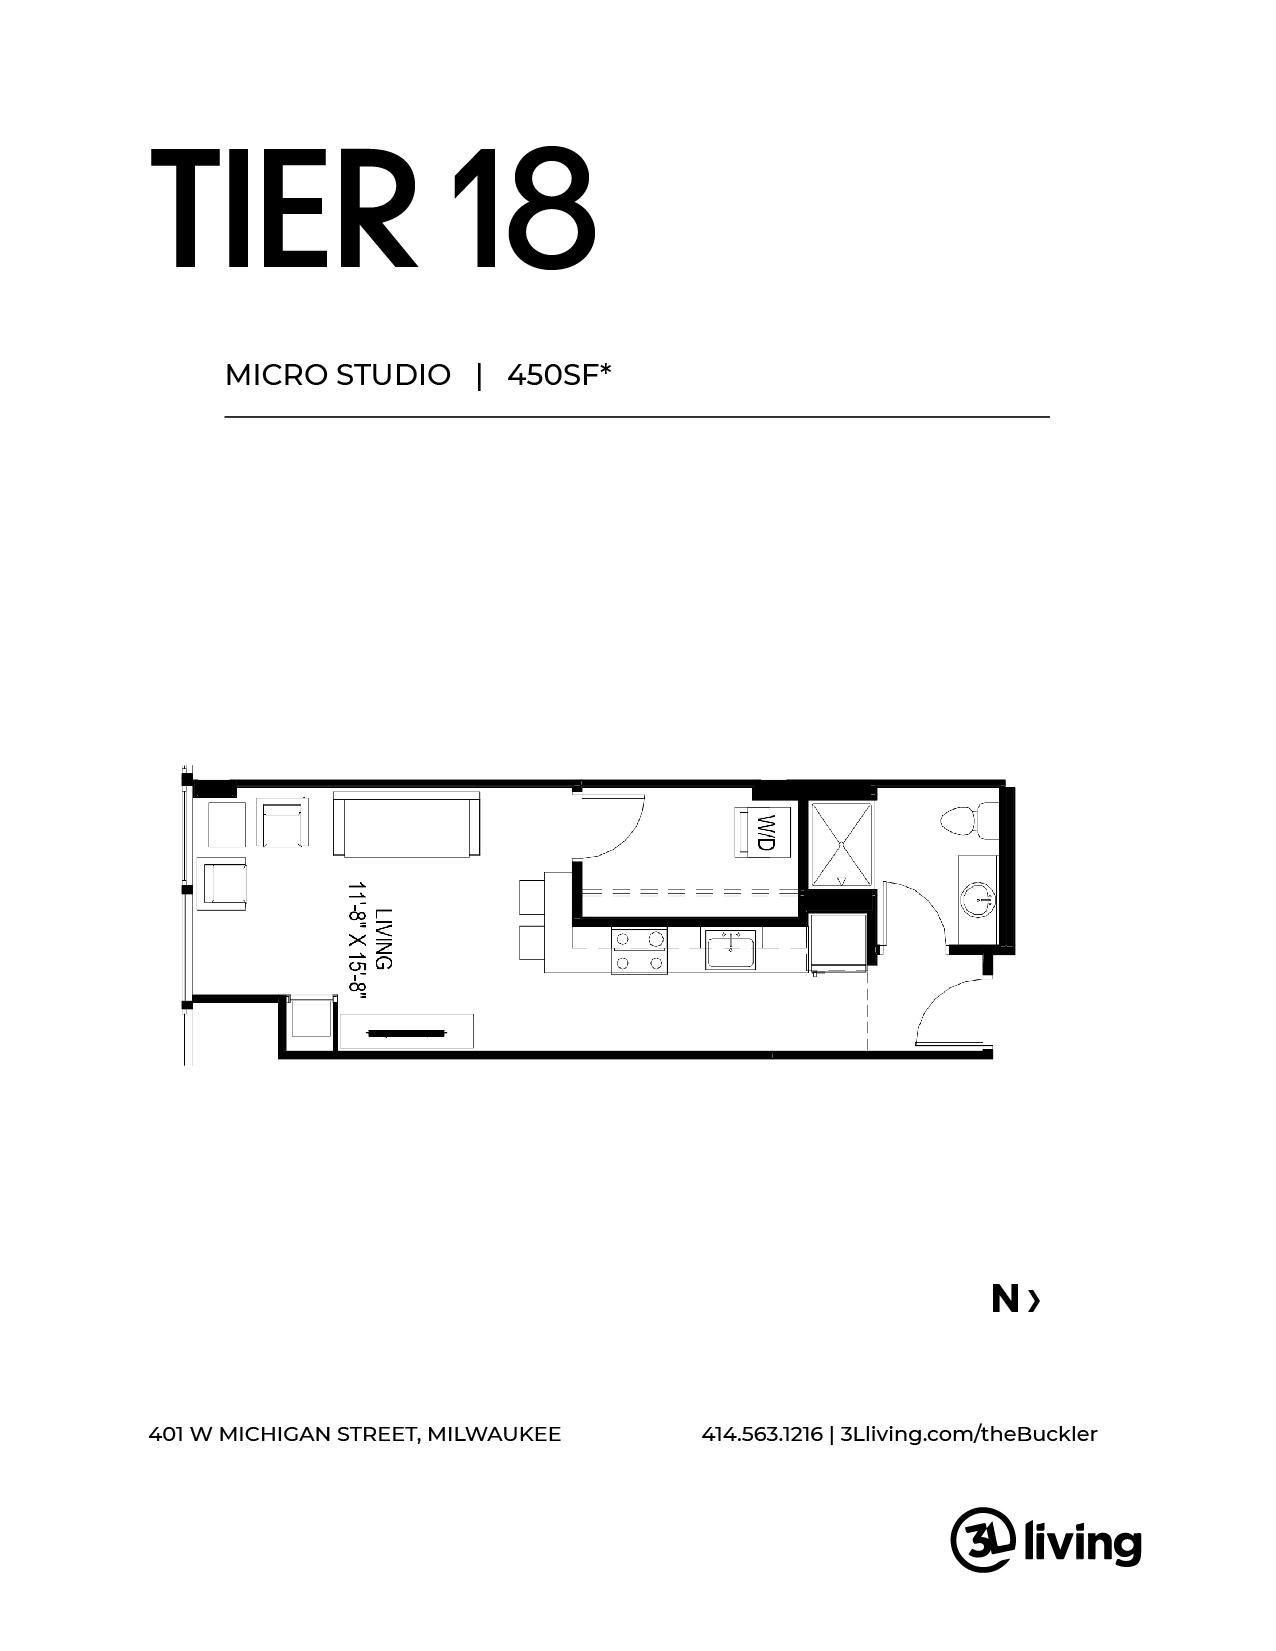 micro unit floor plan of Milwaukee apartment